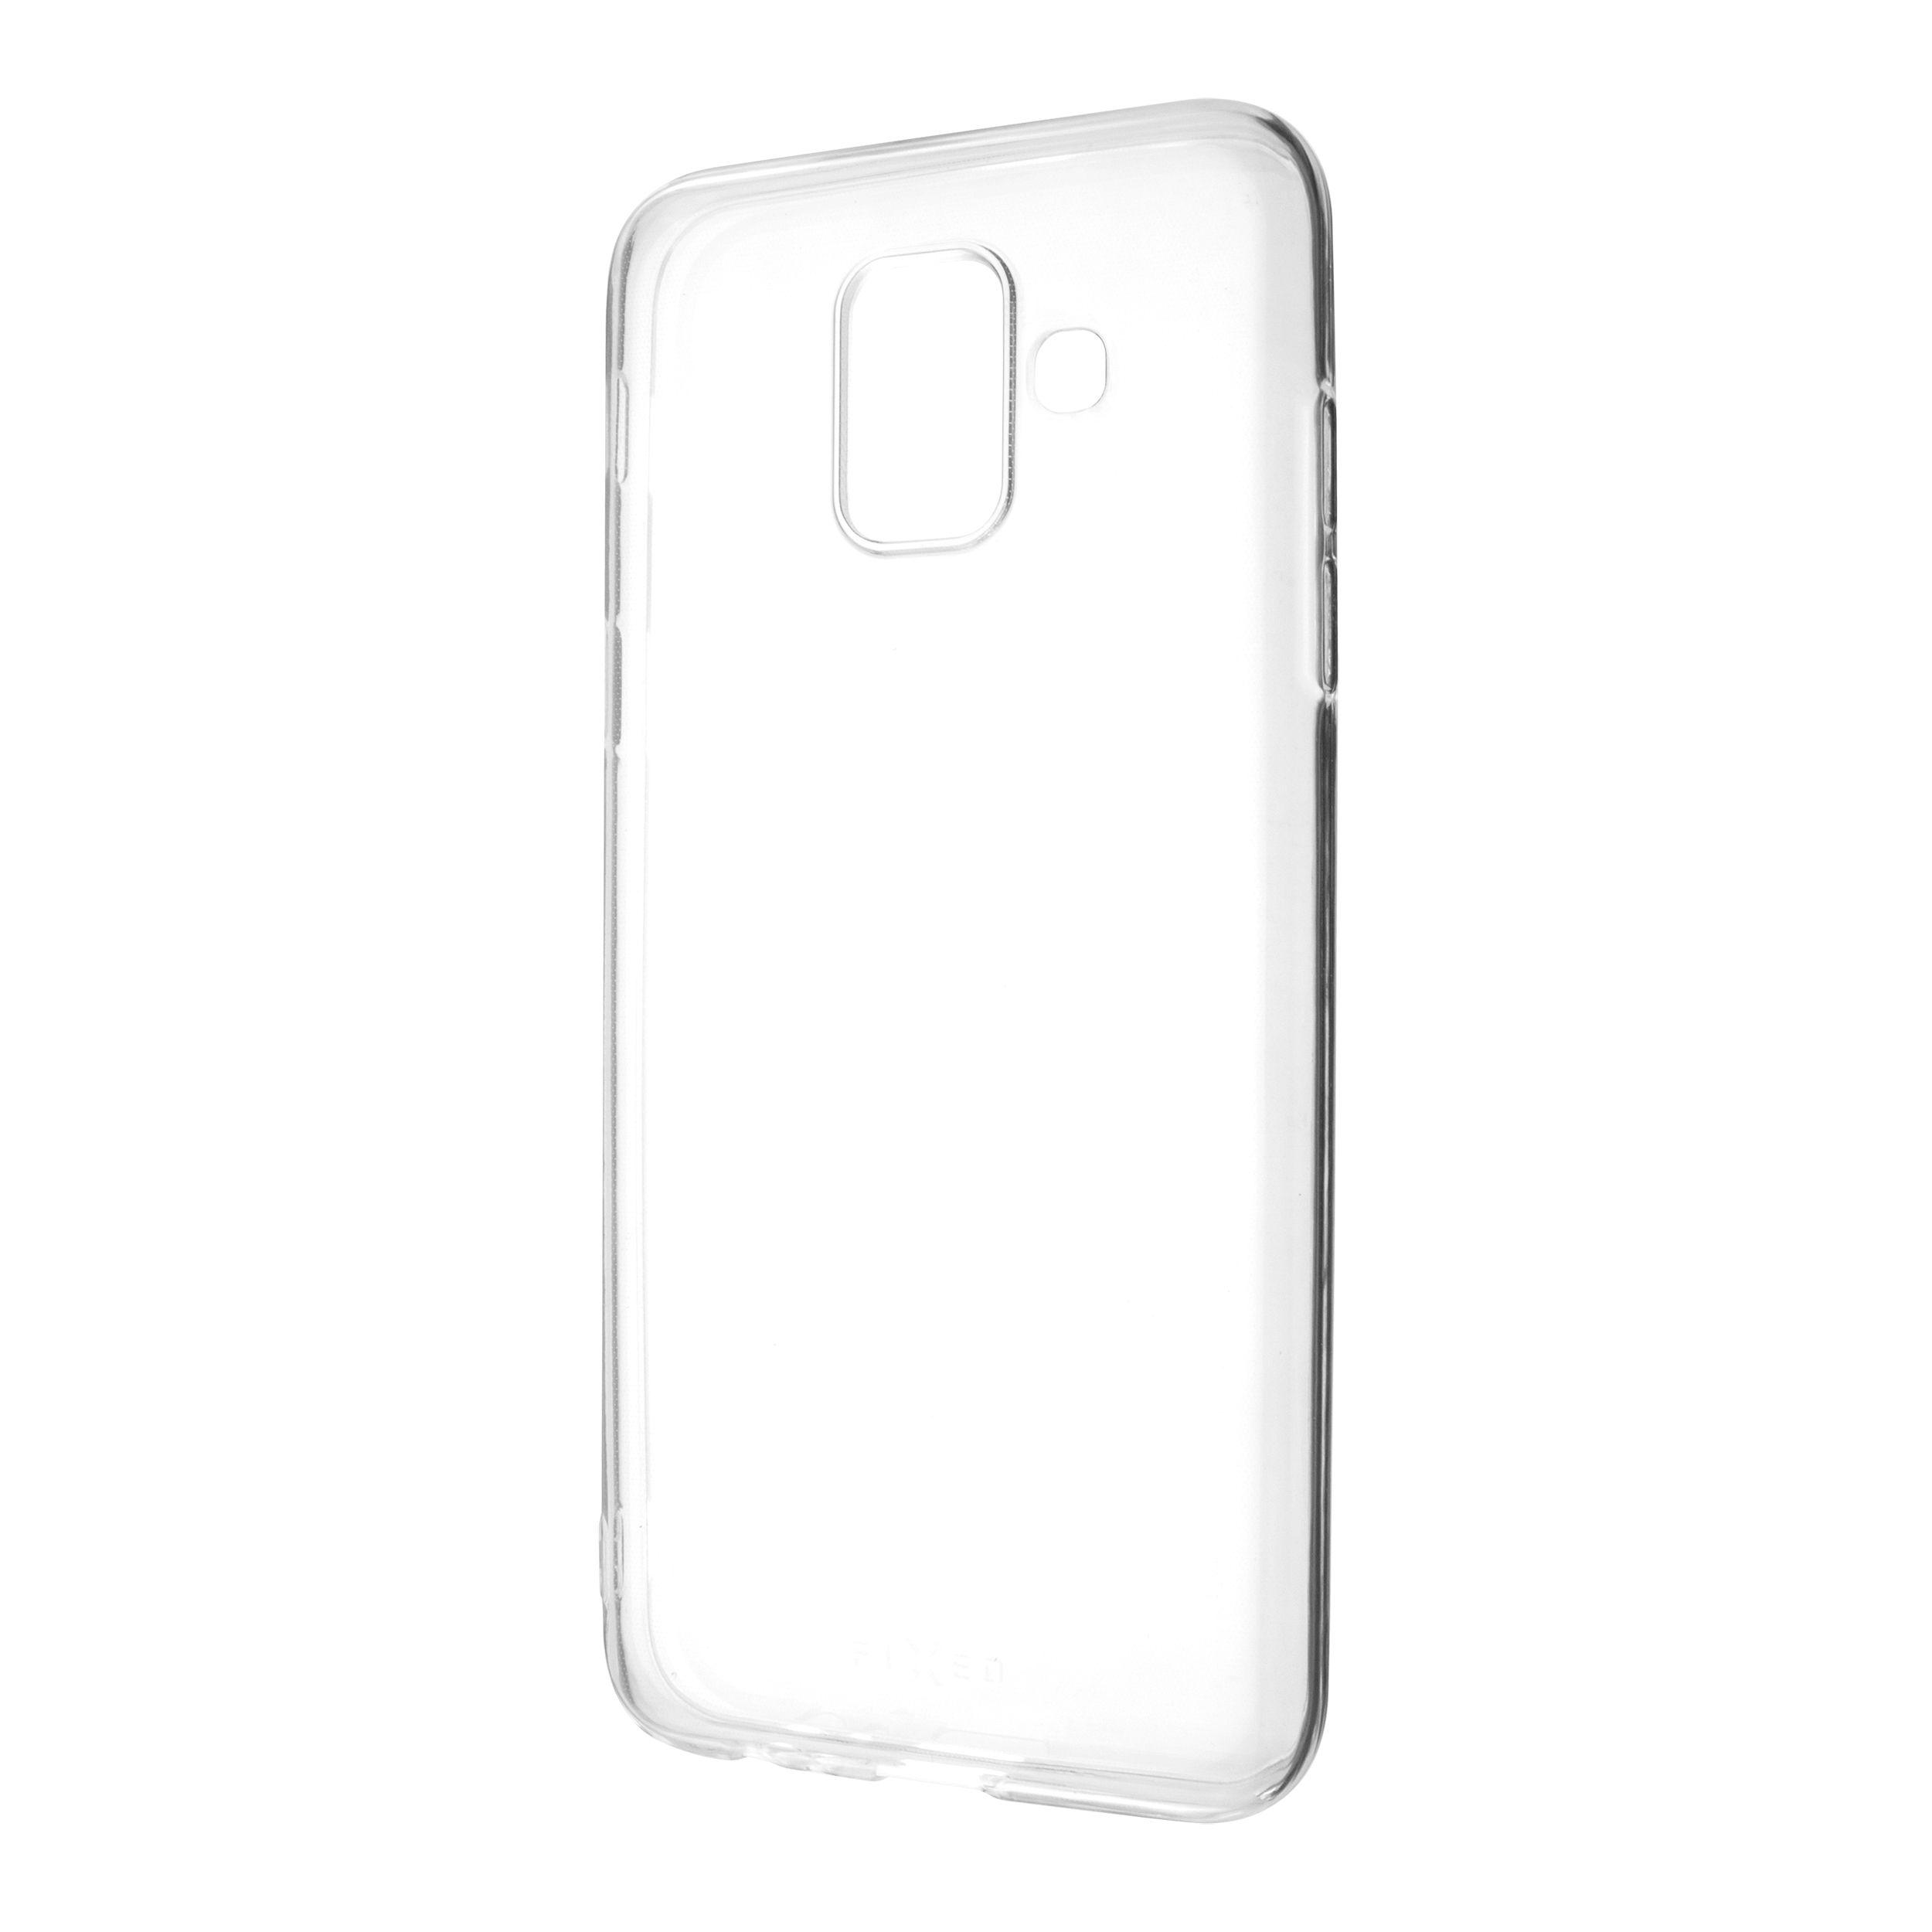 Silikonové pouzdro FIXED pro Samsung Galaxy A6, čiré